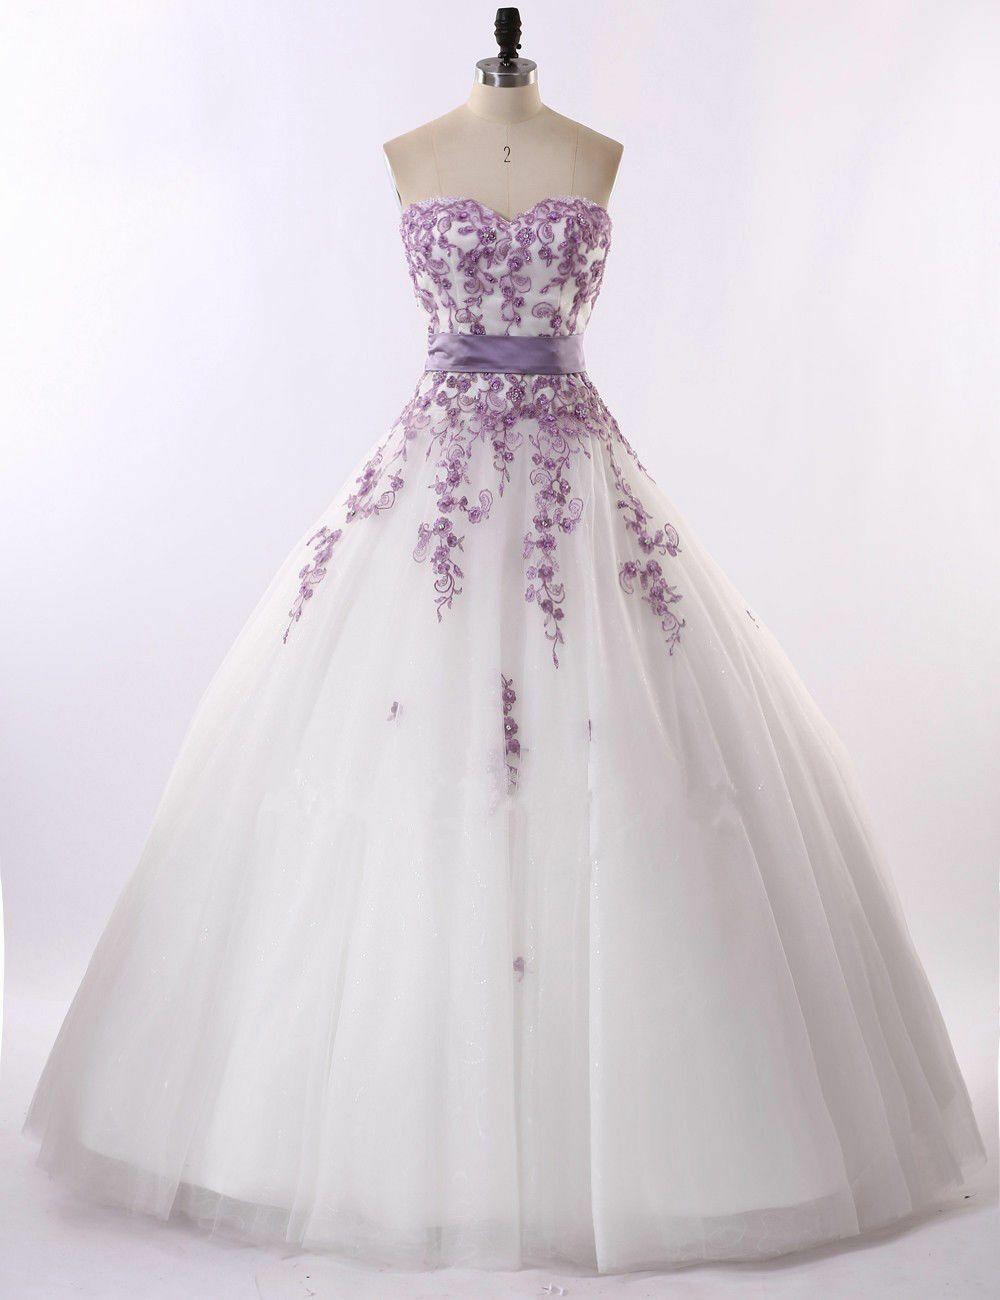 2018 White Ivory And Purple Florals Lace Wedding Dresses Bridal Gown Cu Bridal Dresses Ideas Of B Purple Wedding Dress Applique Wedding Dress Ball Dresses [ 1300 x 1000 Pixel ]